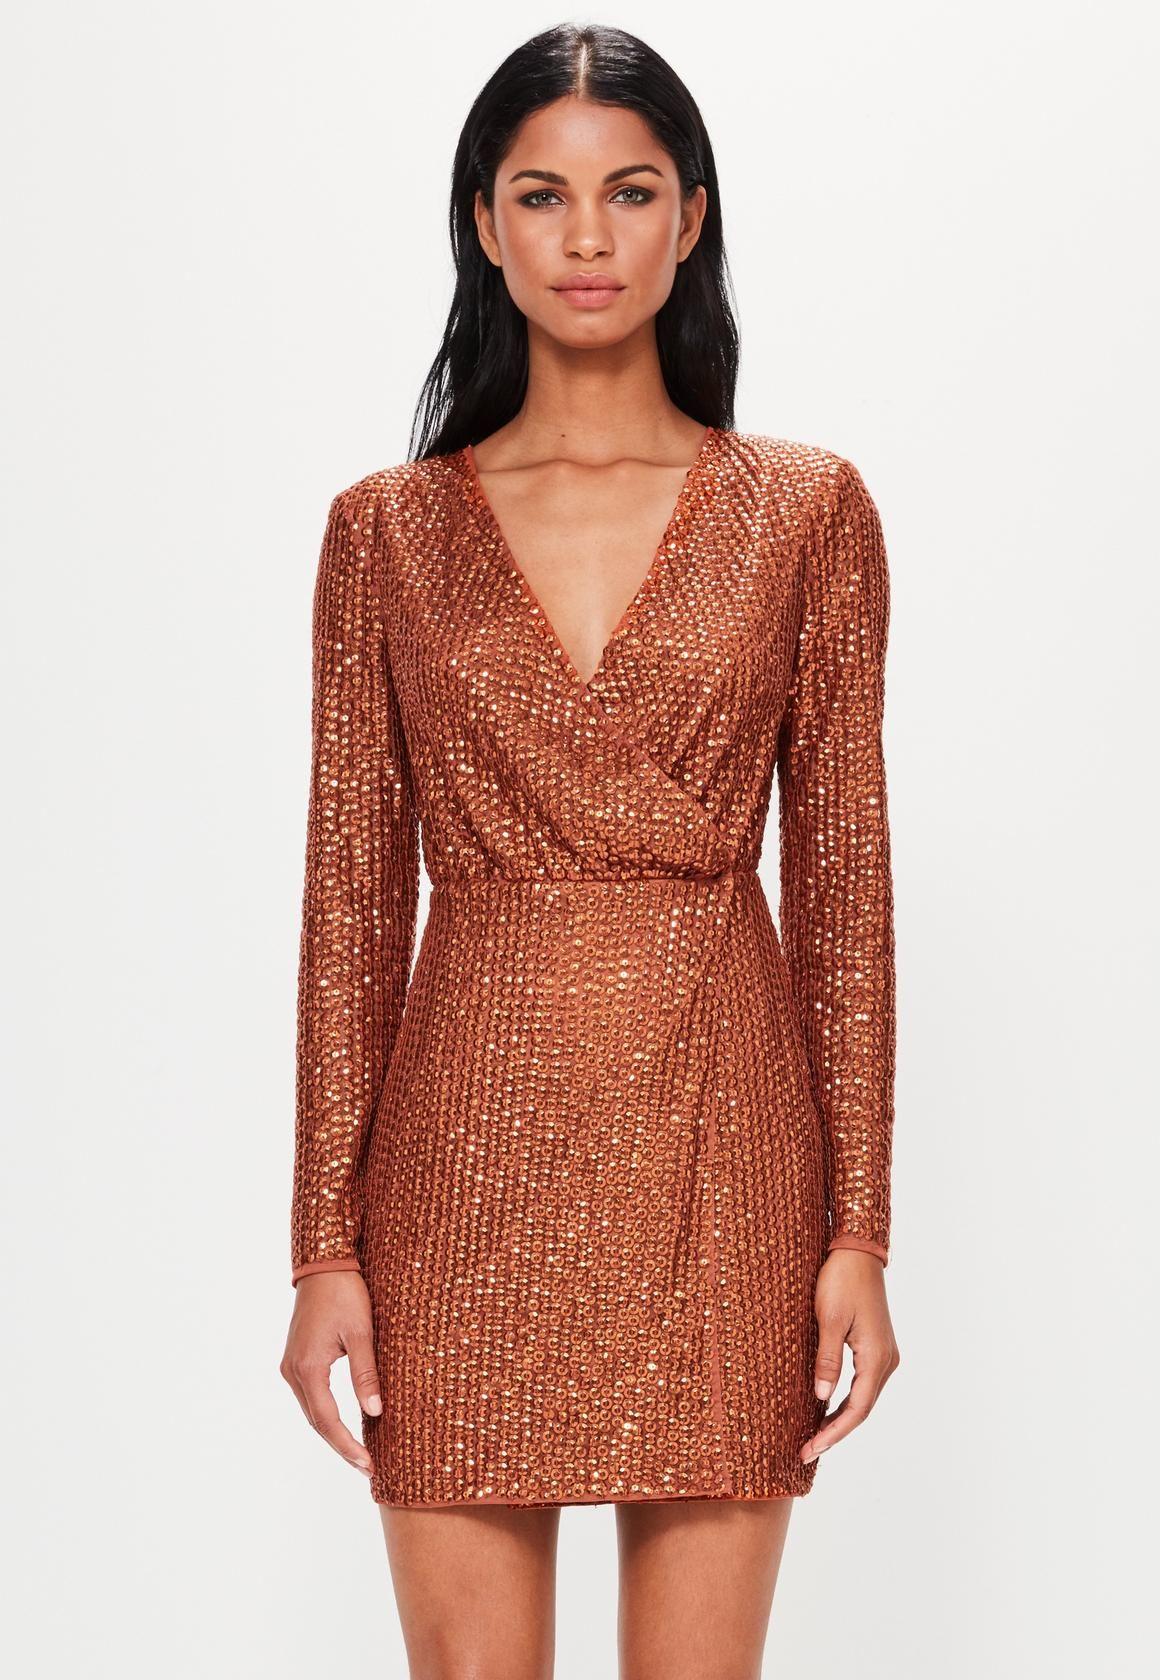 7370abd5190 Missguided - Peace Love Copper Sequin Wrap Mini Dress